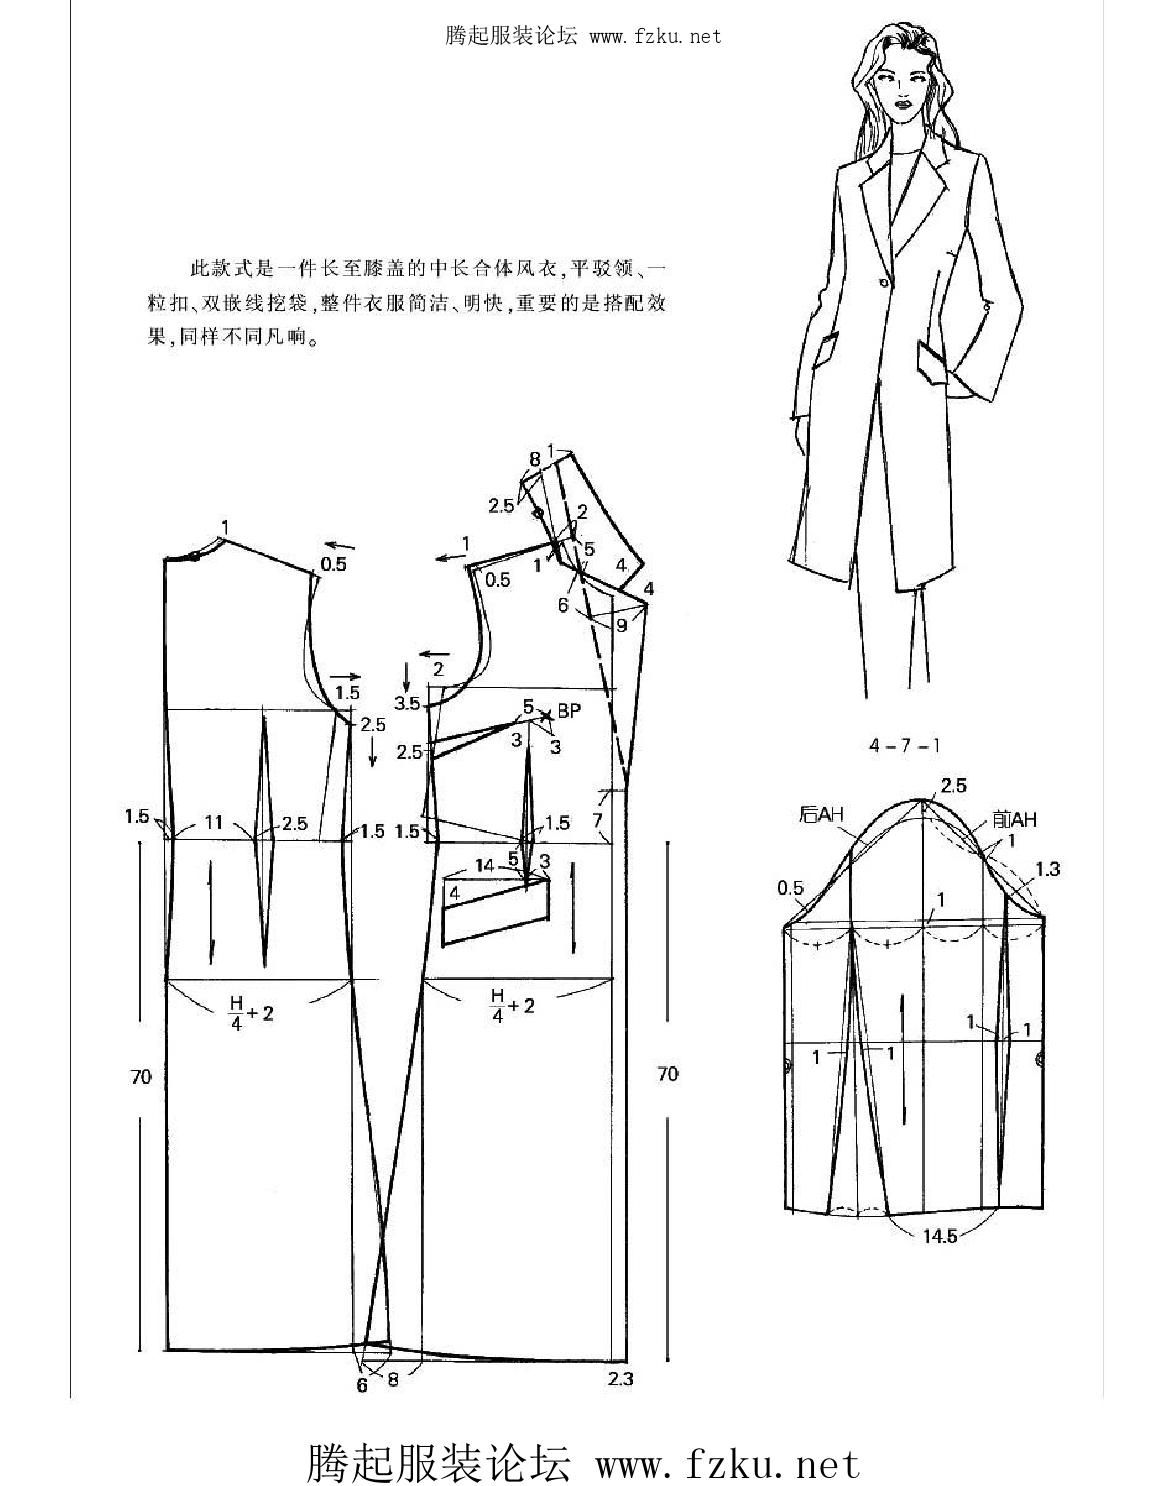 服装裁剪实用手册(上装篇) (1) | Patrones, Costura y Molde